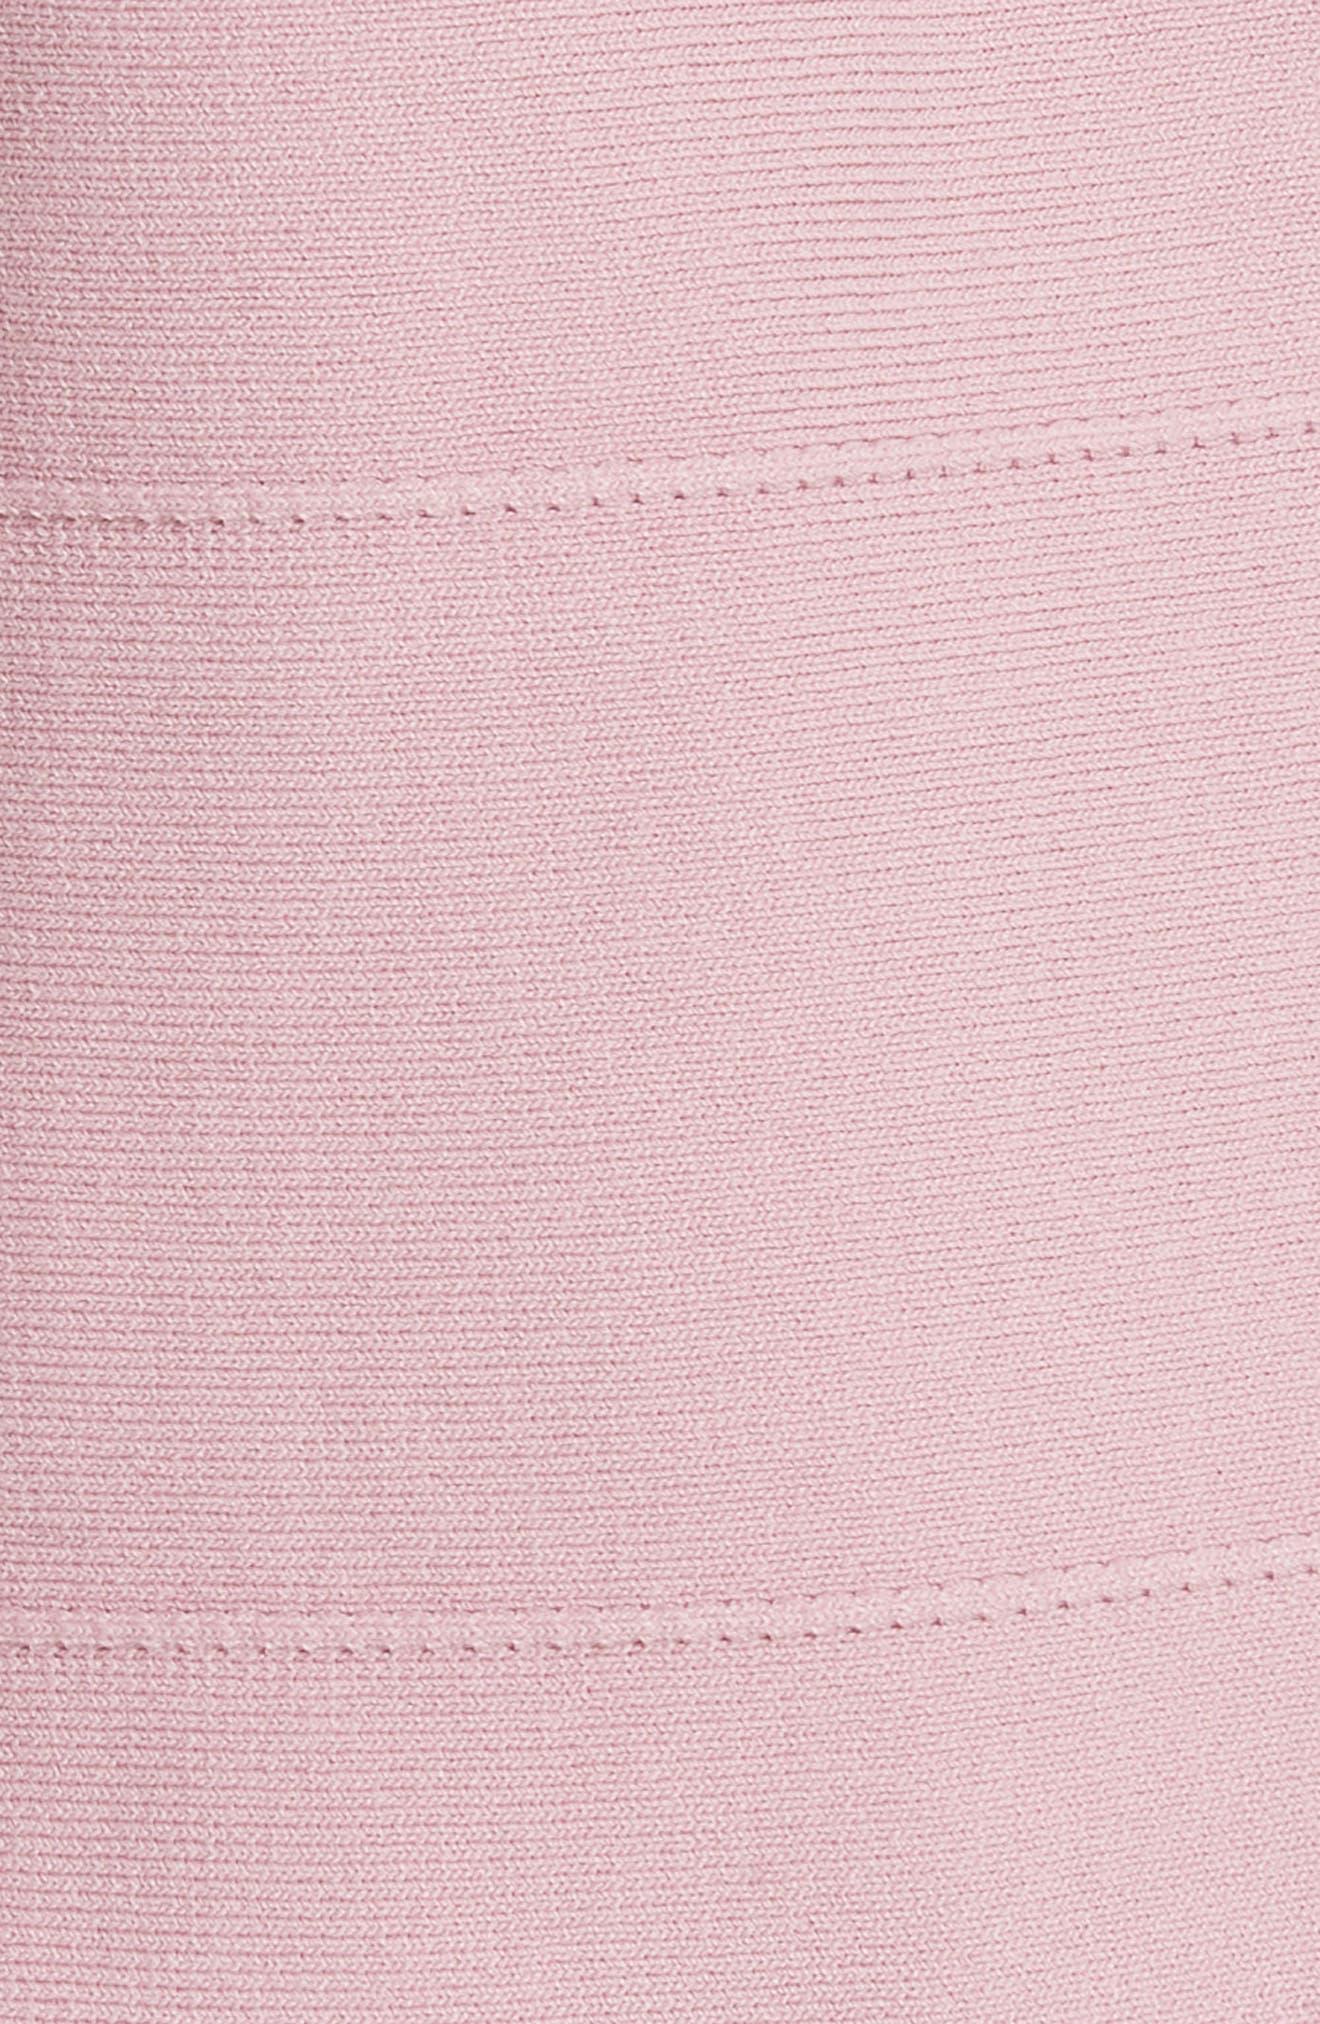 Bow Neck Knit Top,                             Alternate thumbnail 5, color,                             Dusky Pink